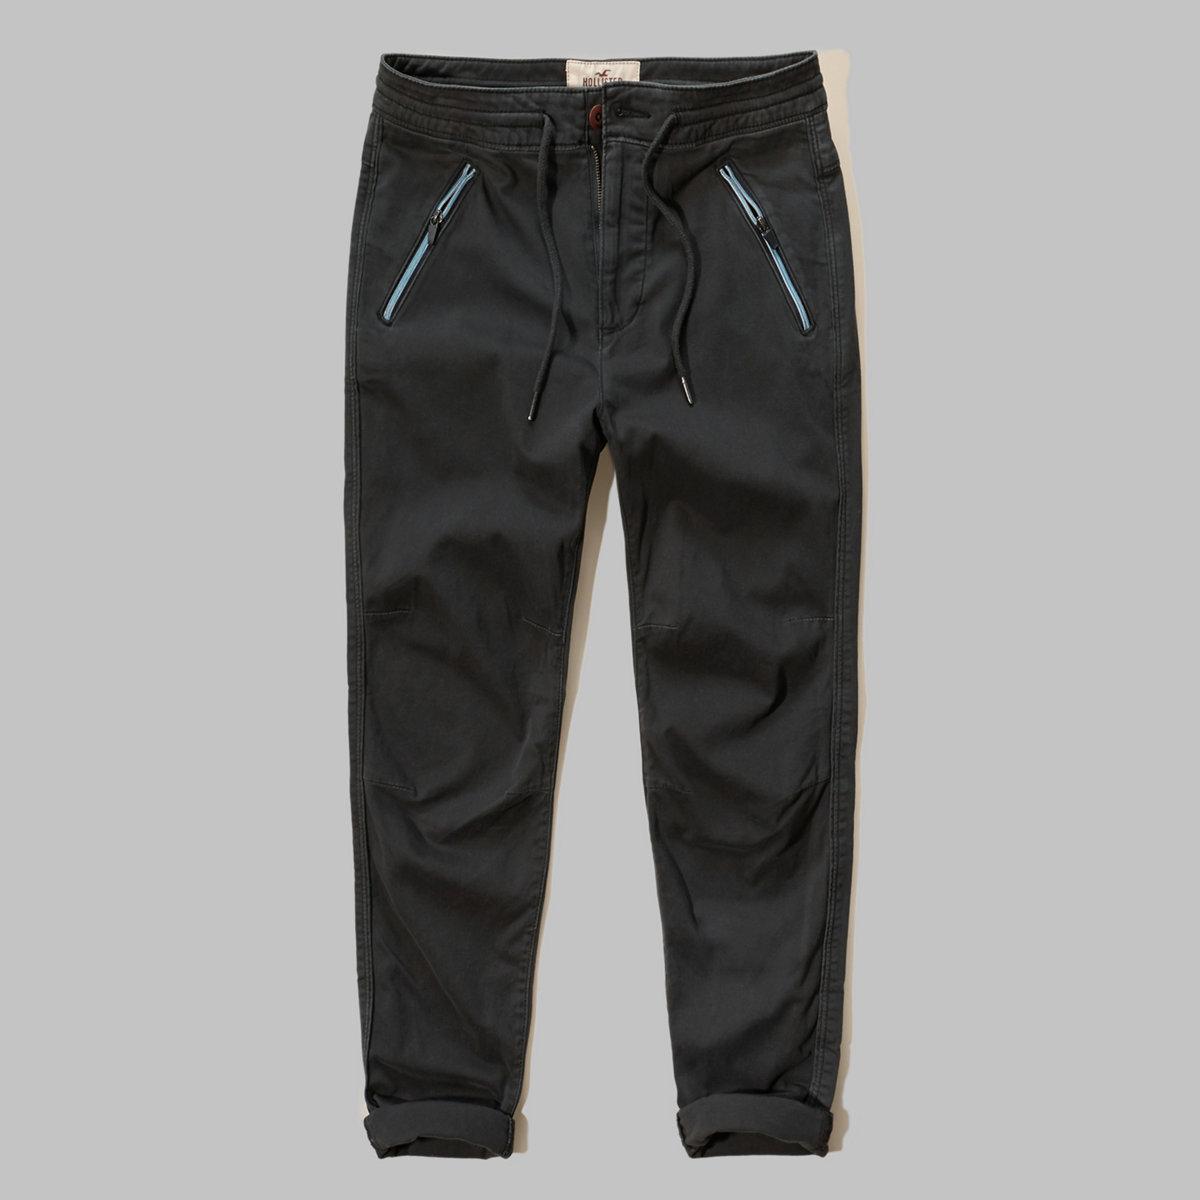 Hollister Hybrid Twill Jogger Pants